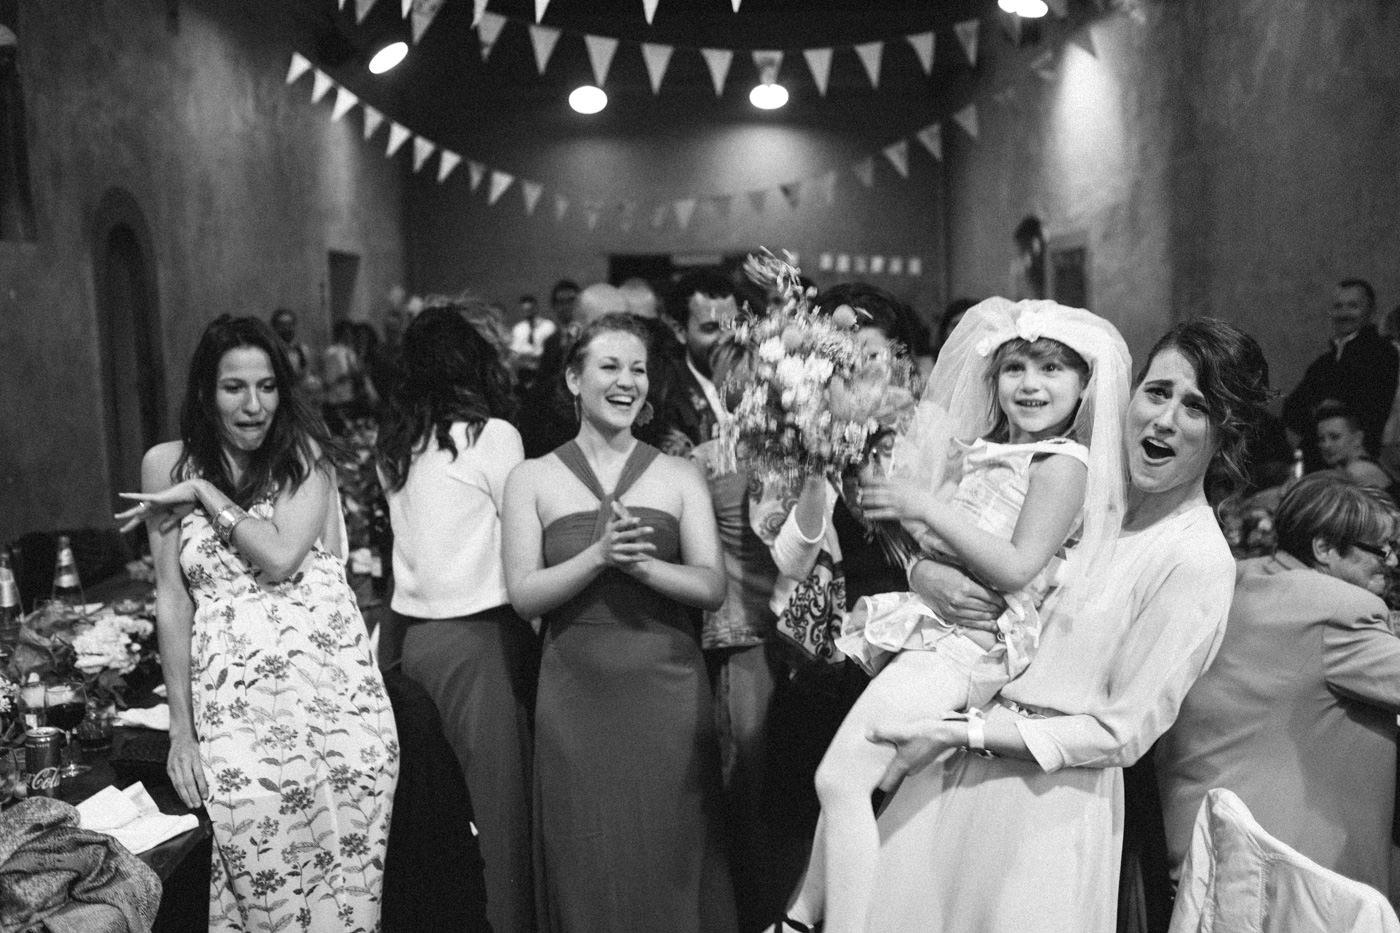 matrimoni_all_italiana_fotografo_matrimonio_toscana-80.jpg